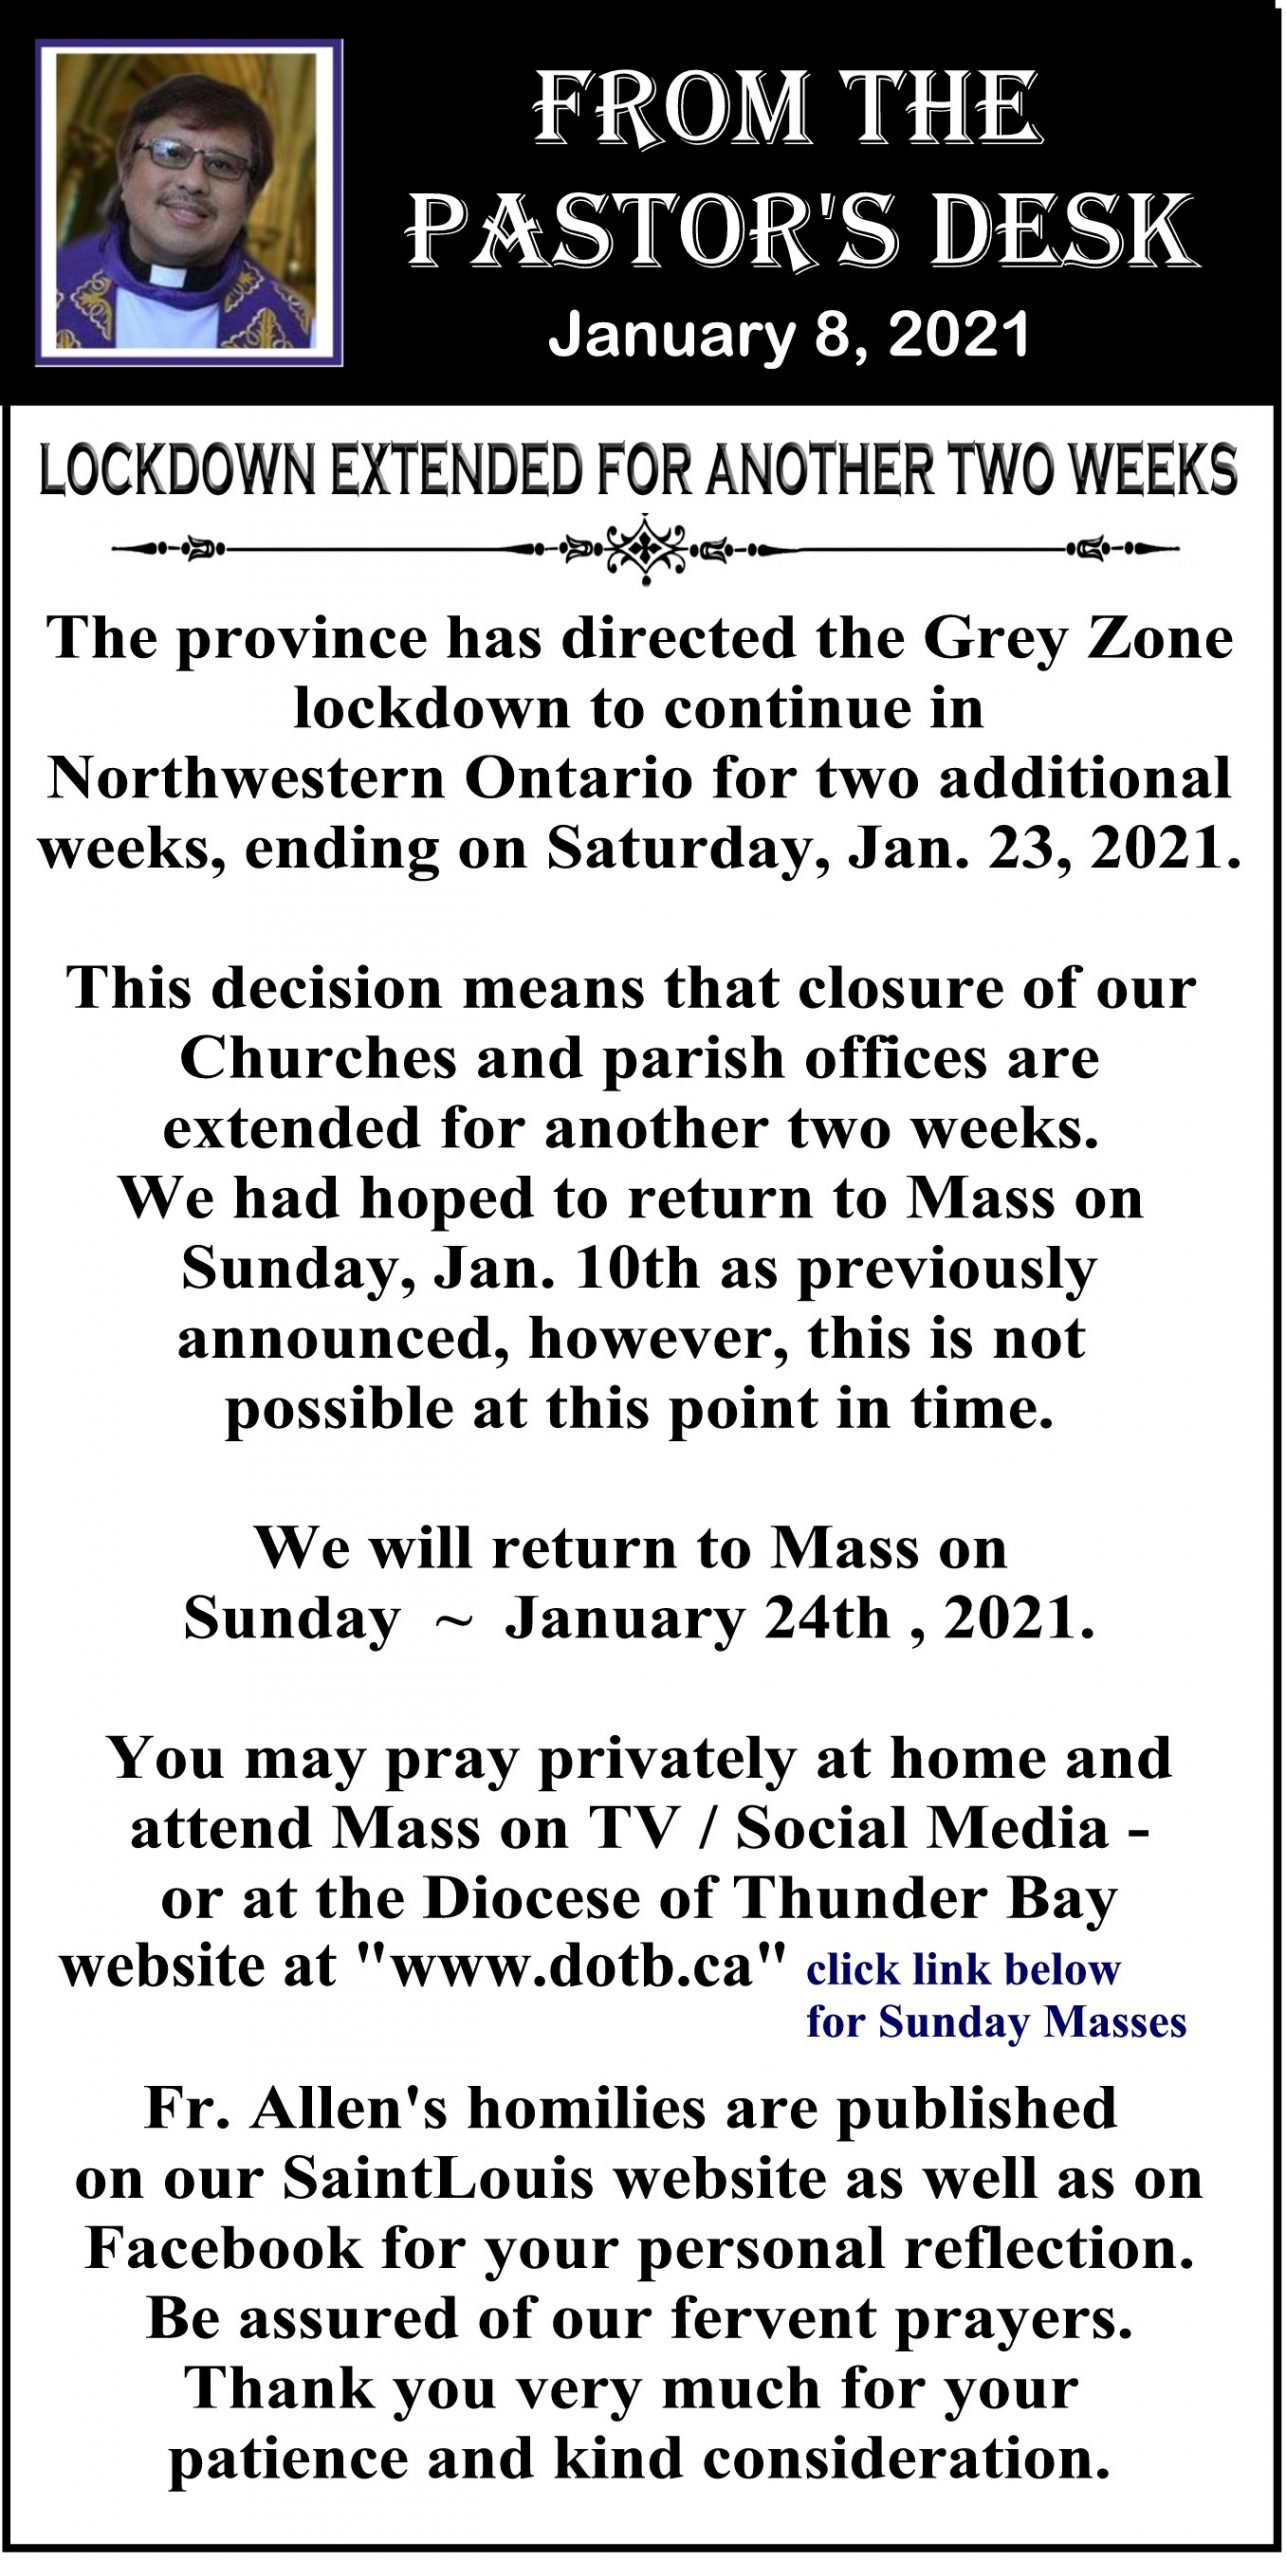 Saint Louis - Fr. Allen lockdown update Jan 8, 2021